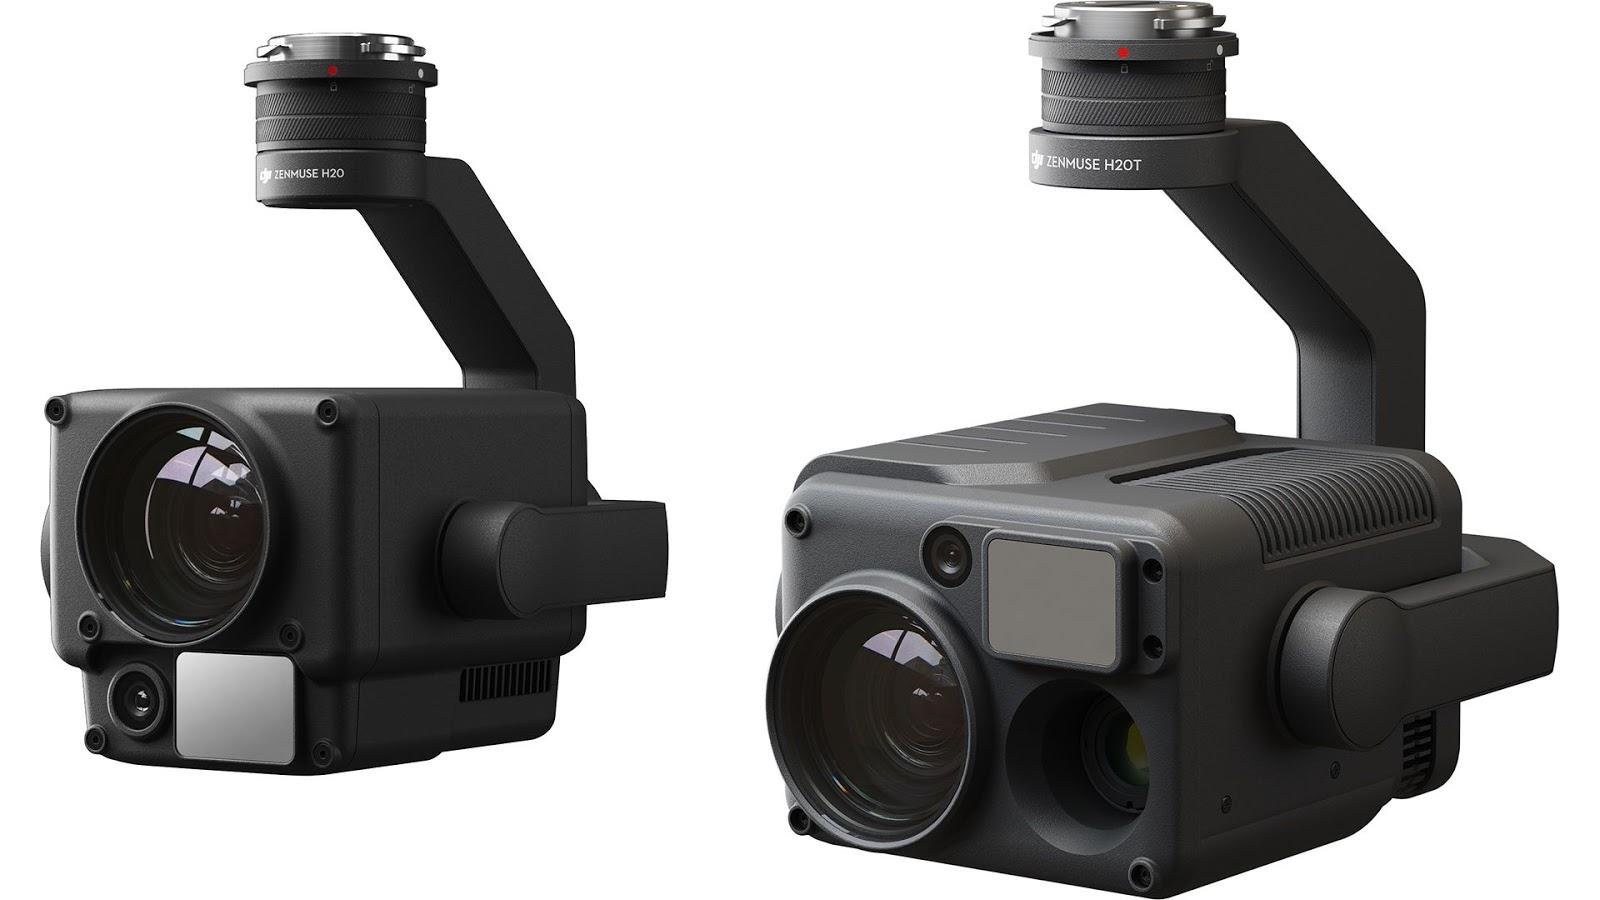 Камеры DJI Zenmuse H20 и H20T